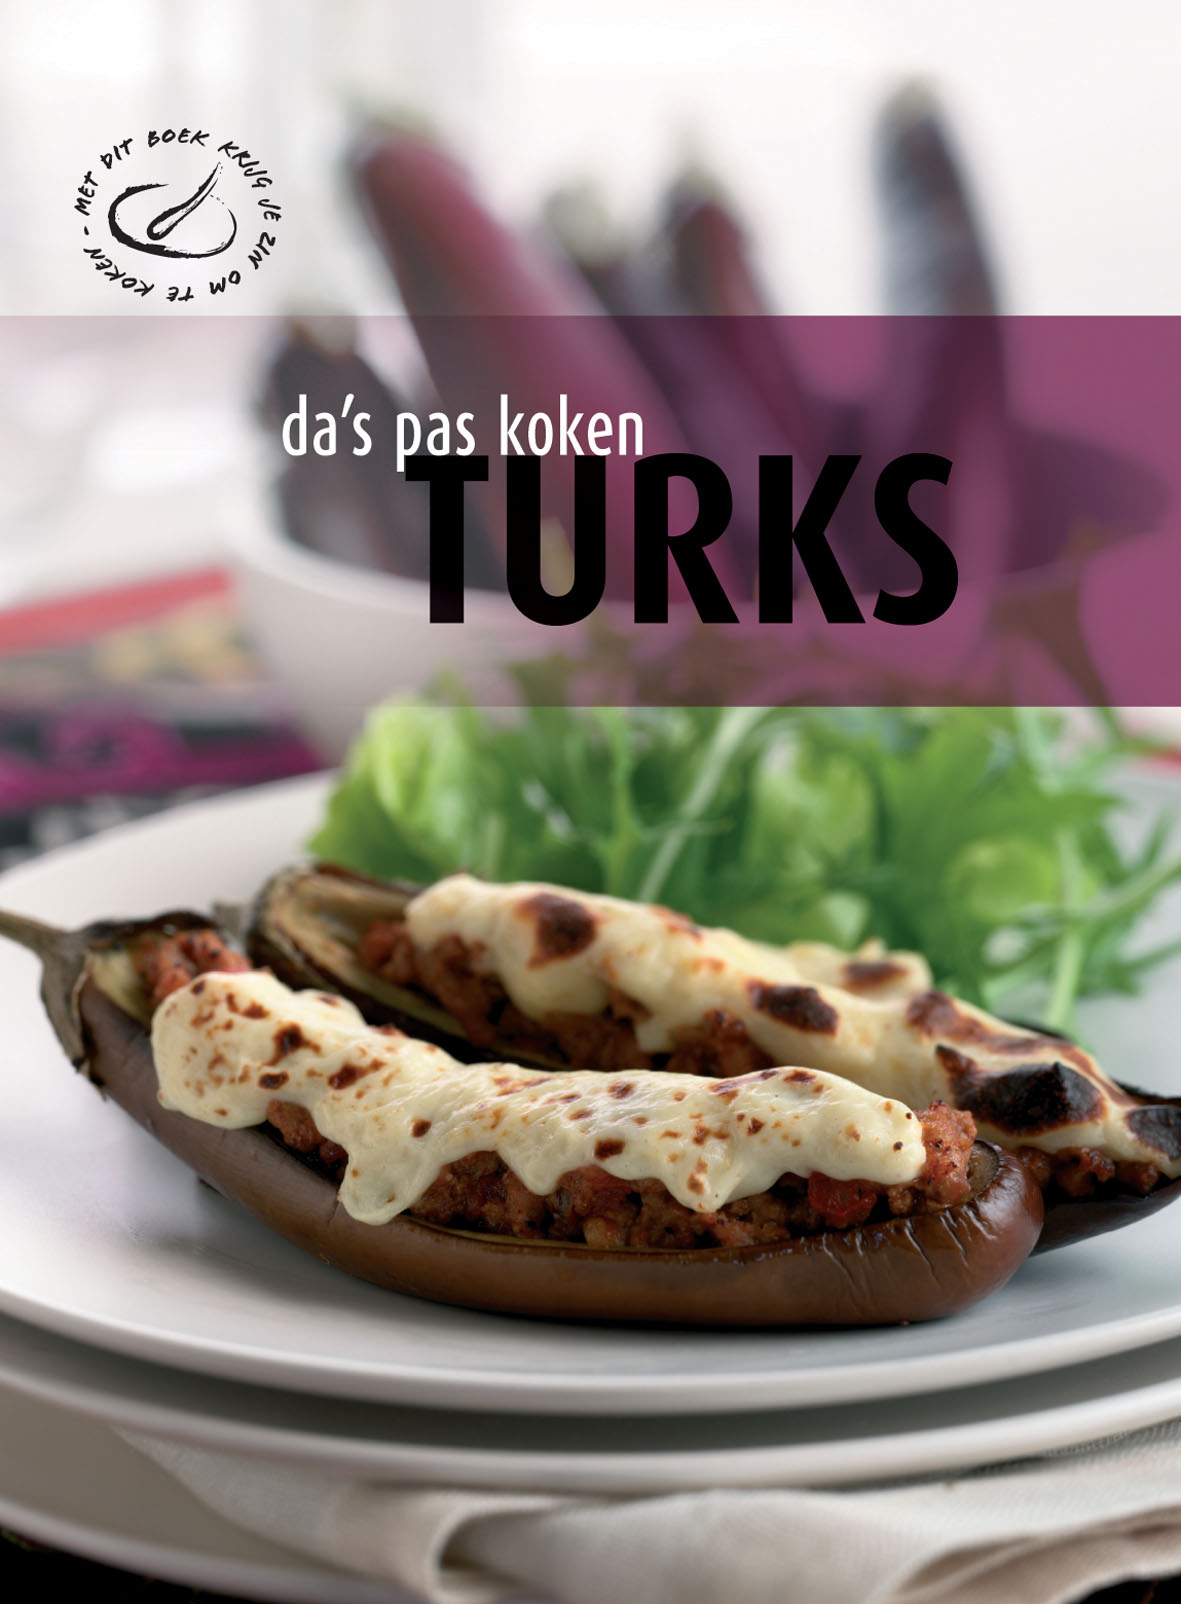 Turks - Da'S Pas Koken